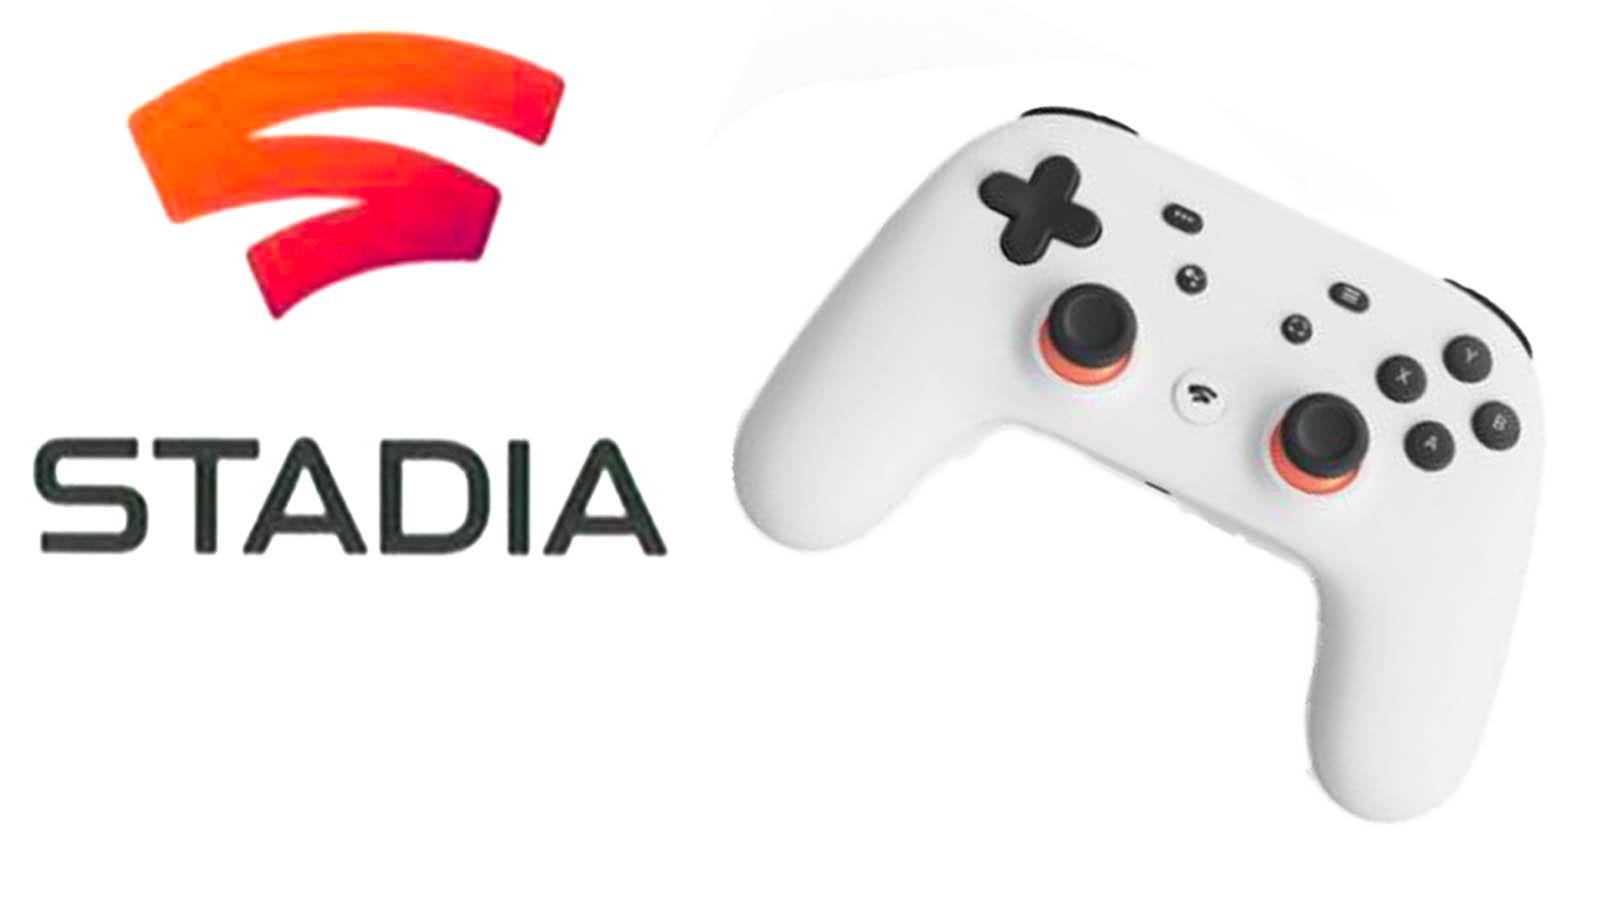 Google Shuts Down Internal Stadia Studios - Game News Plus 🎮 - Game News Plus